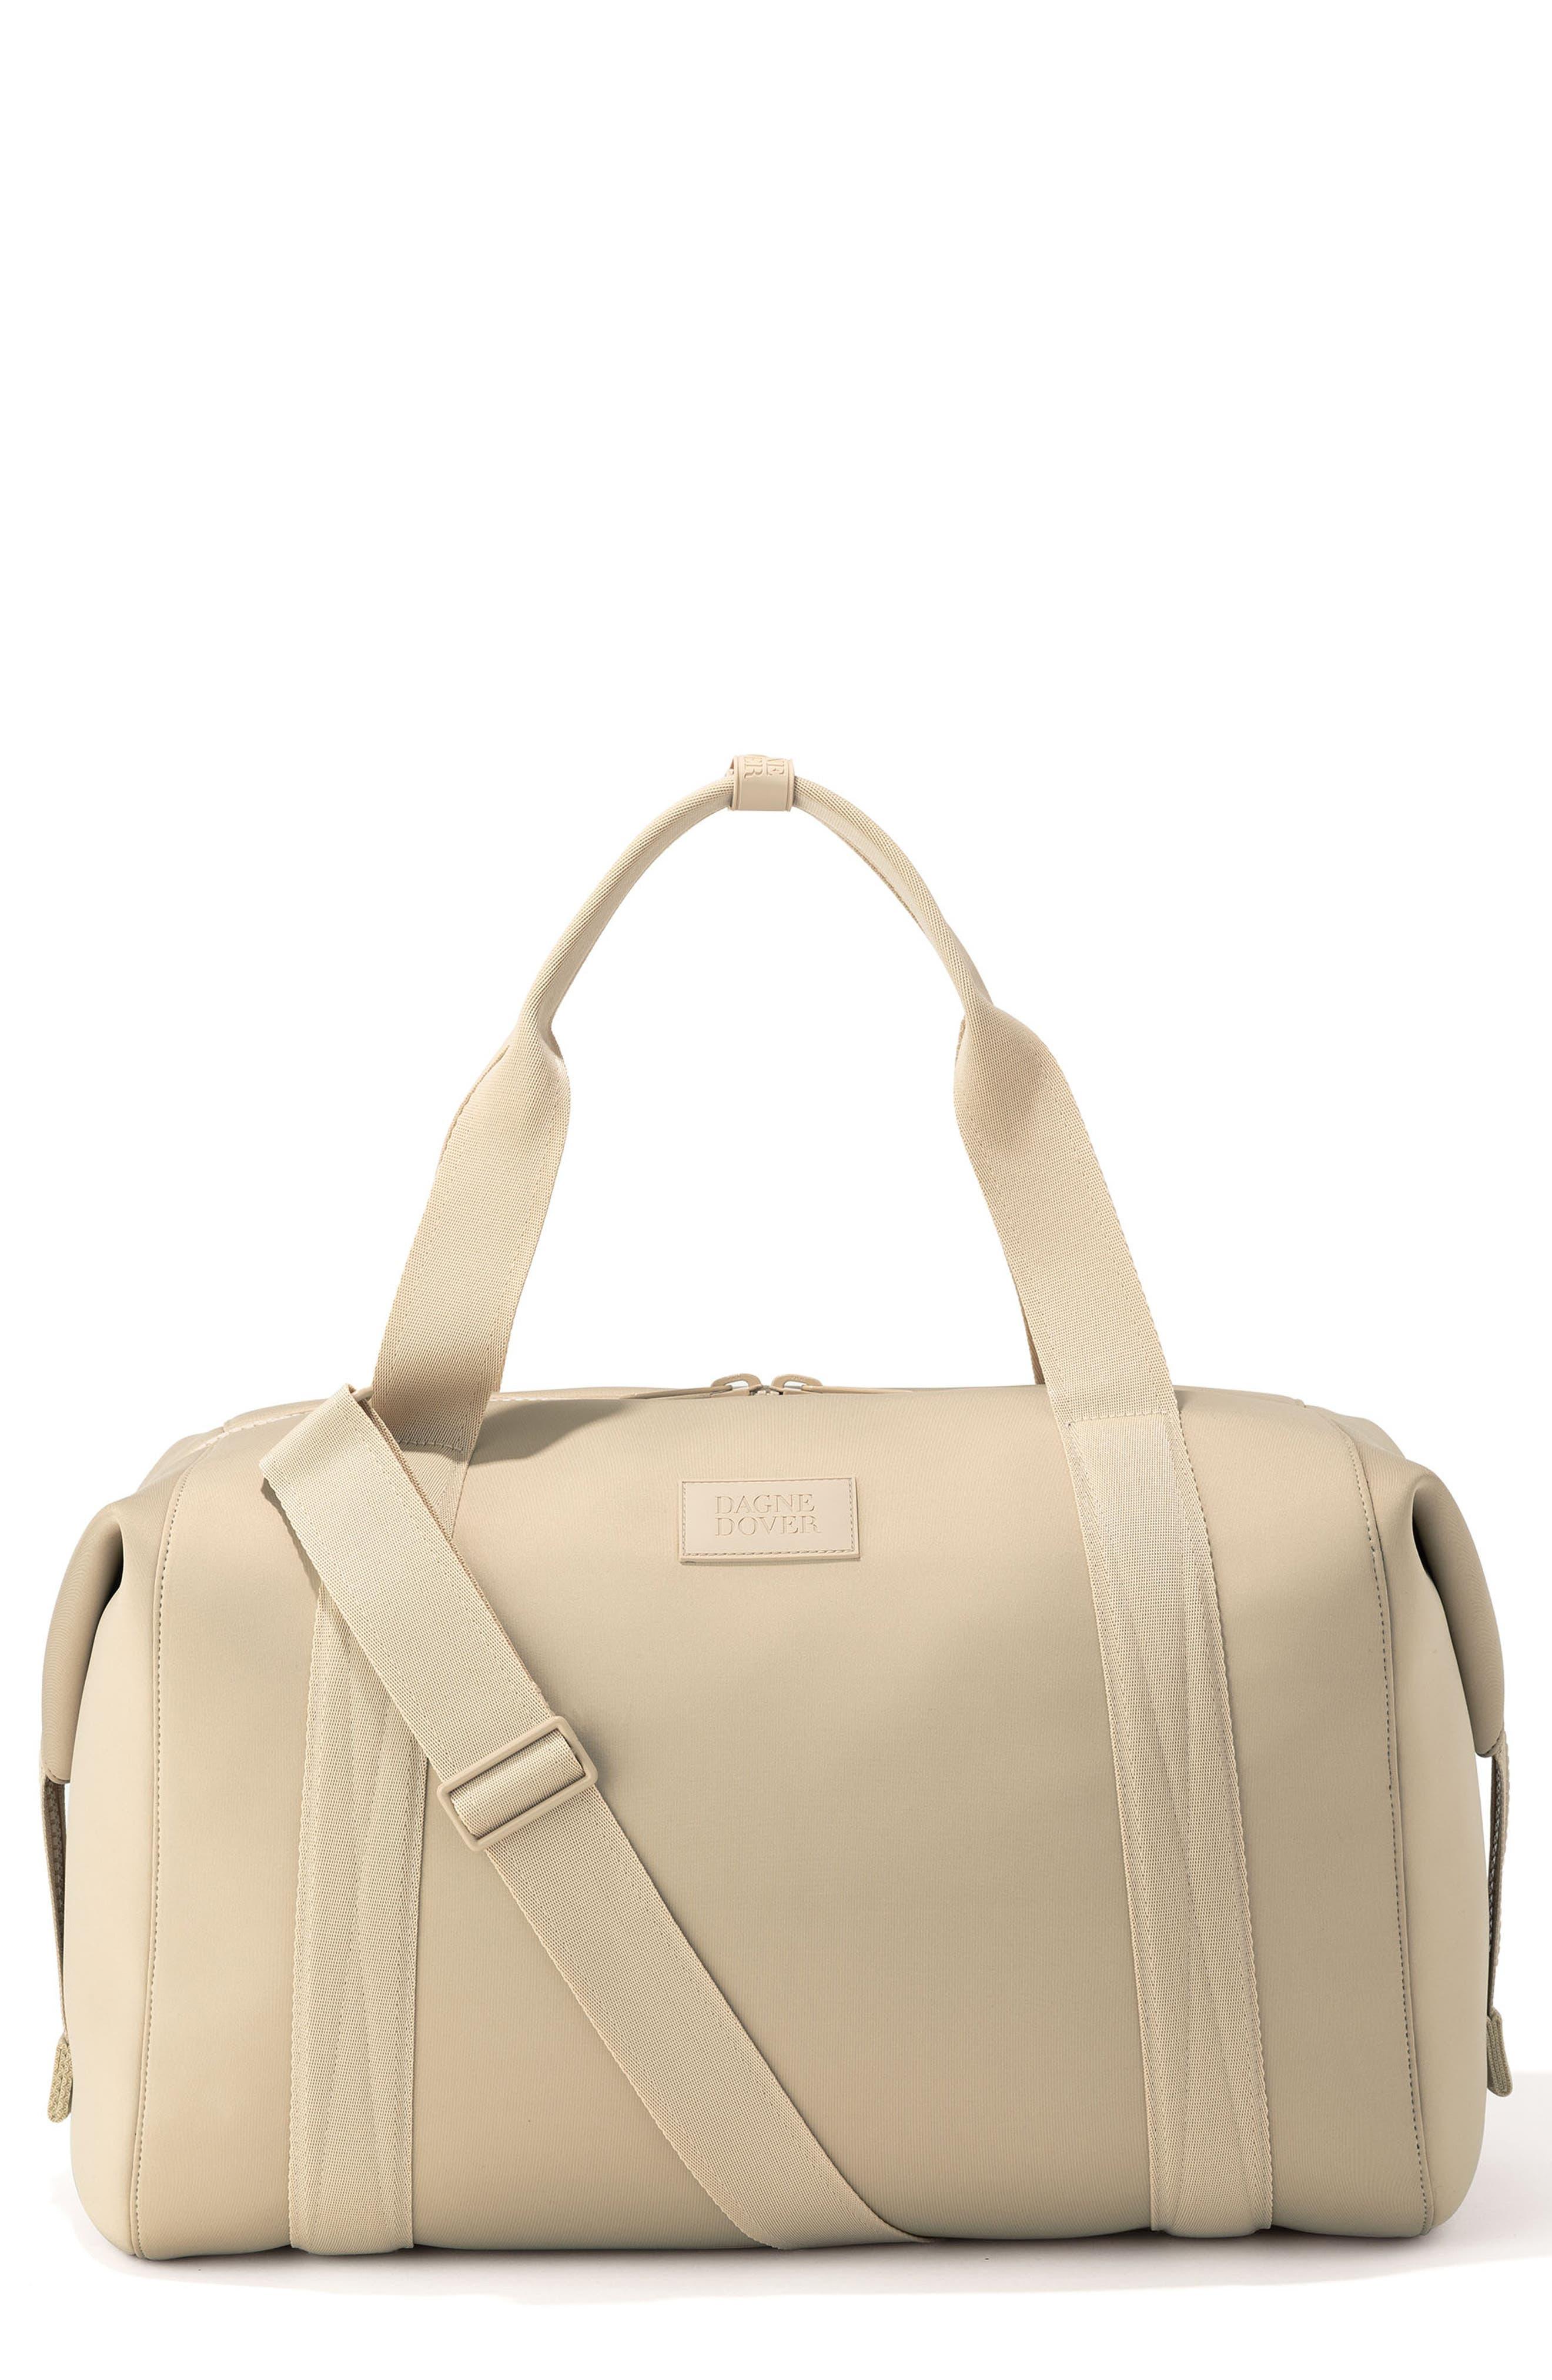 DAGNE DOVER, XL Landon Carryall Duffle Bag, Main thumbnail 1, color, ALMOND LATTE